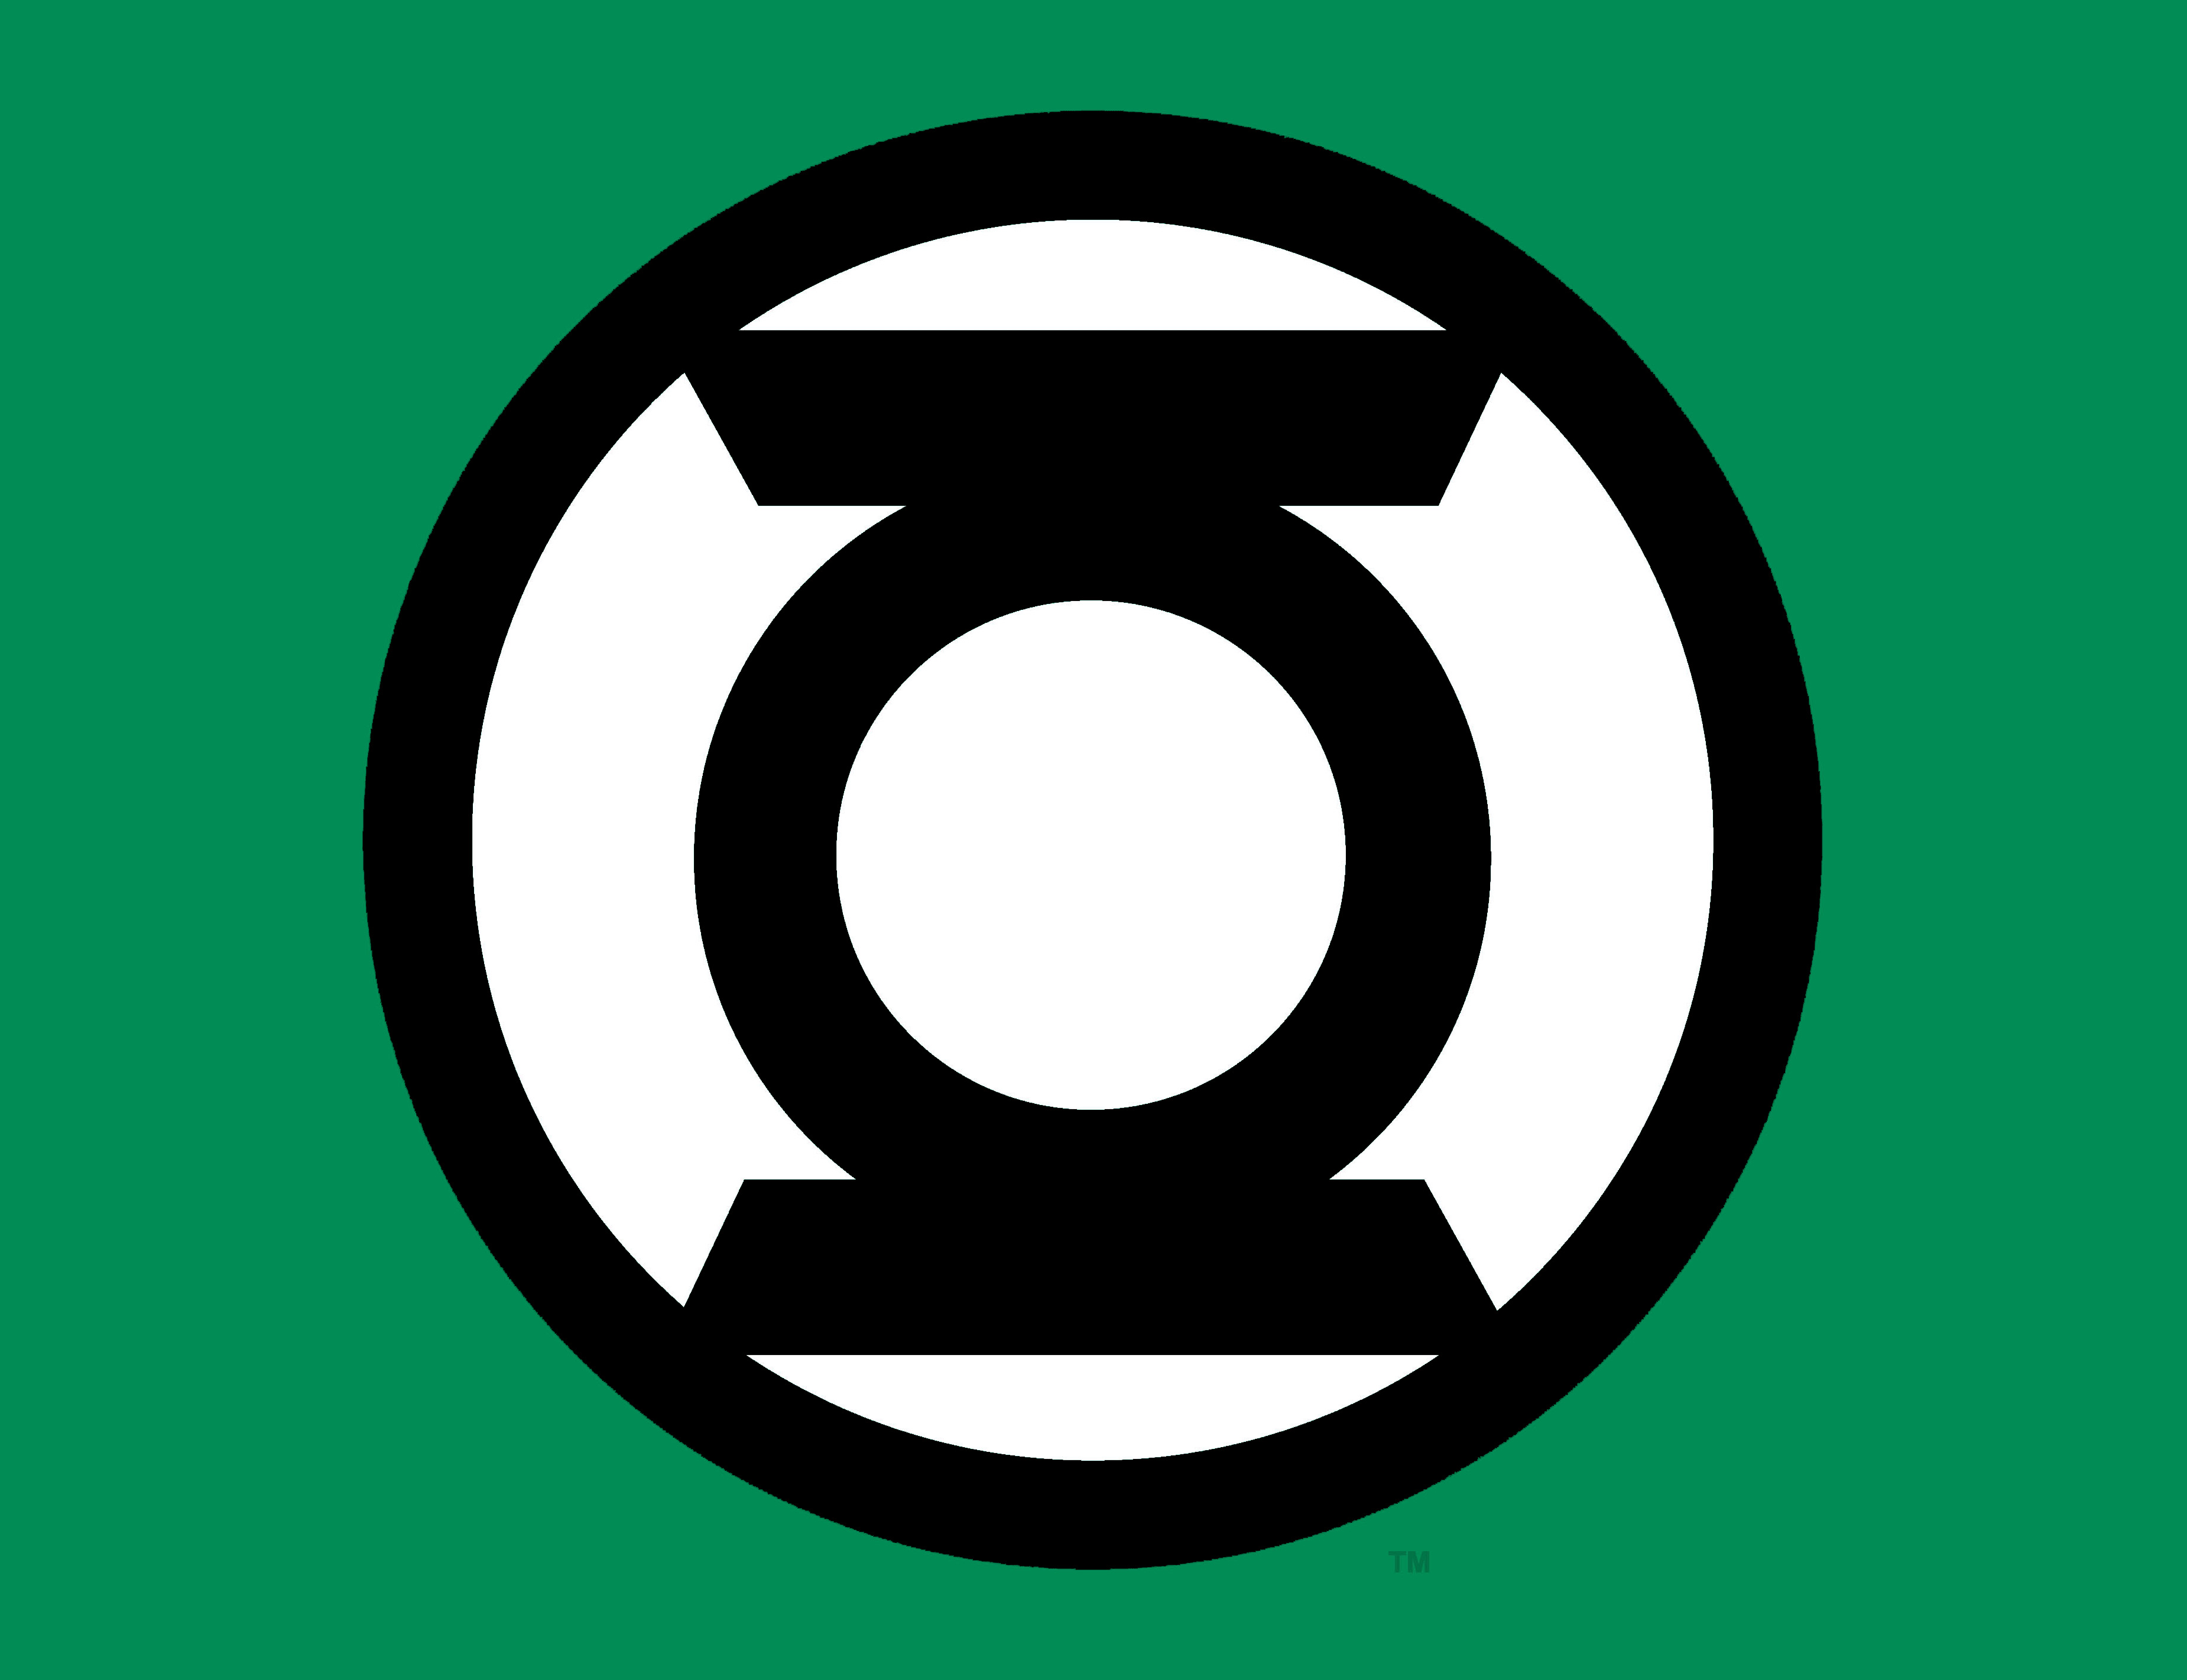 Meaning Green Lantern logo and symbol.